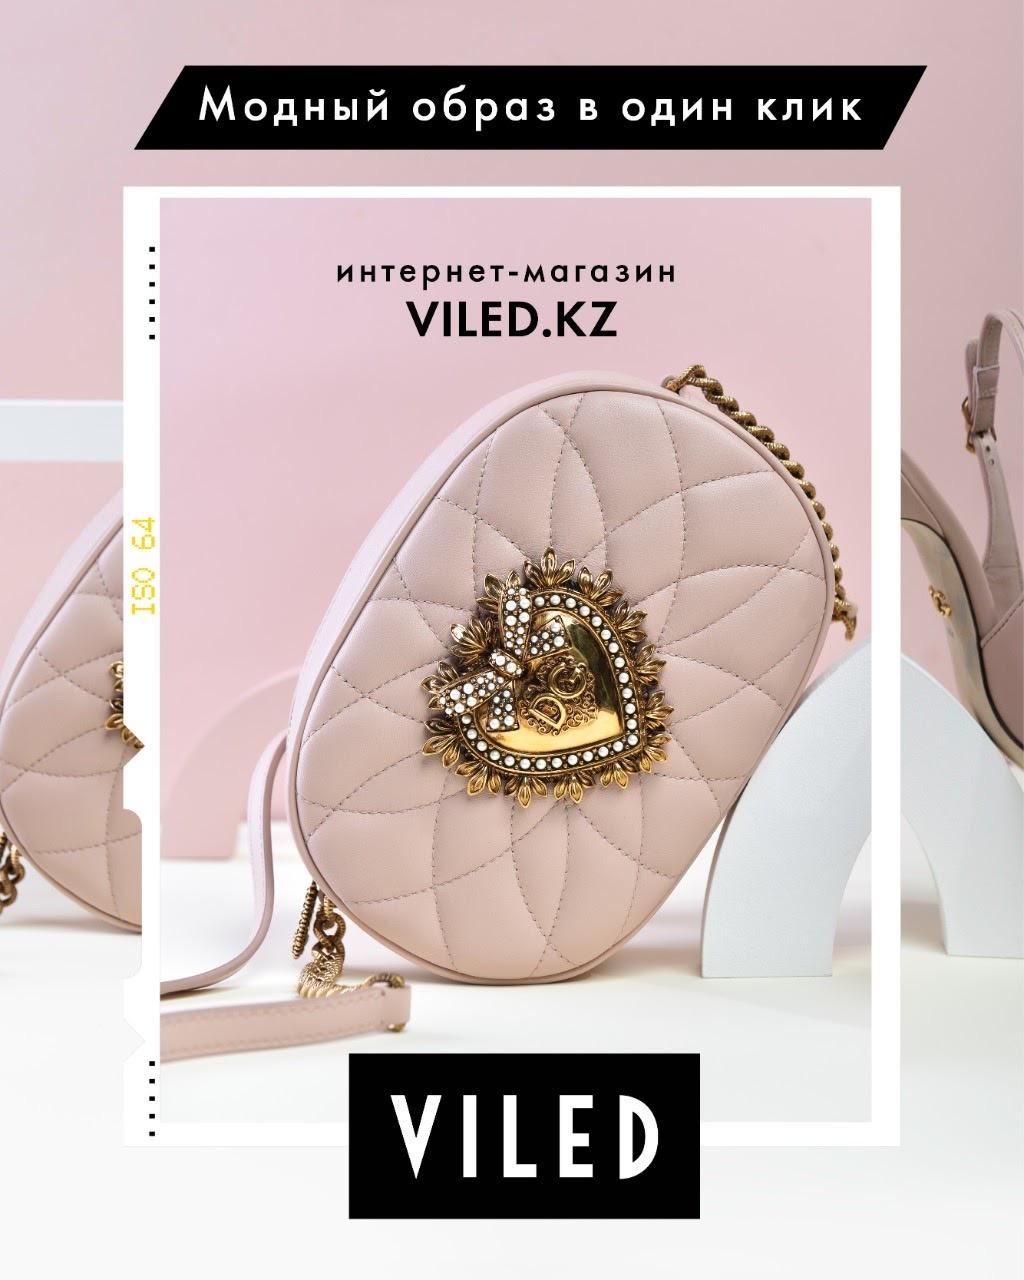 VILED.kz